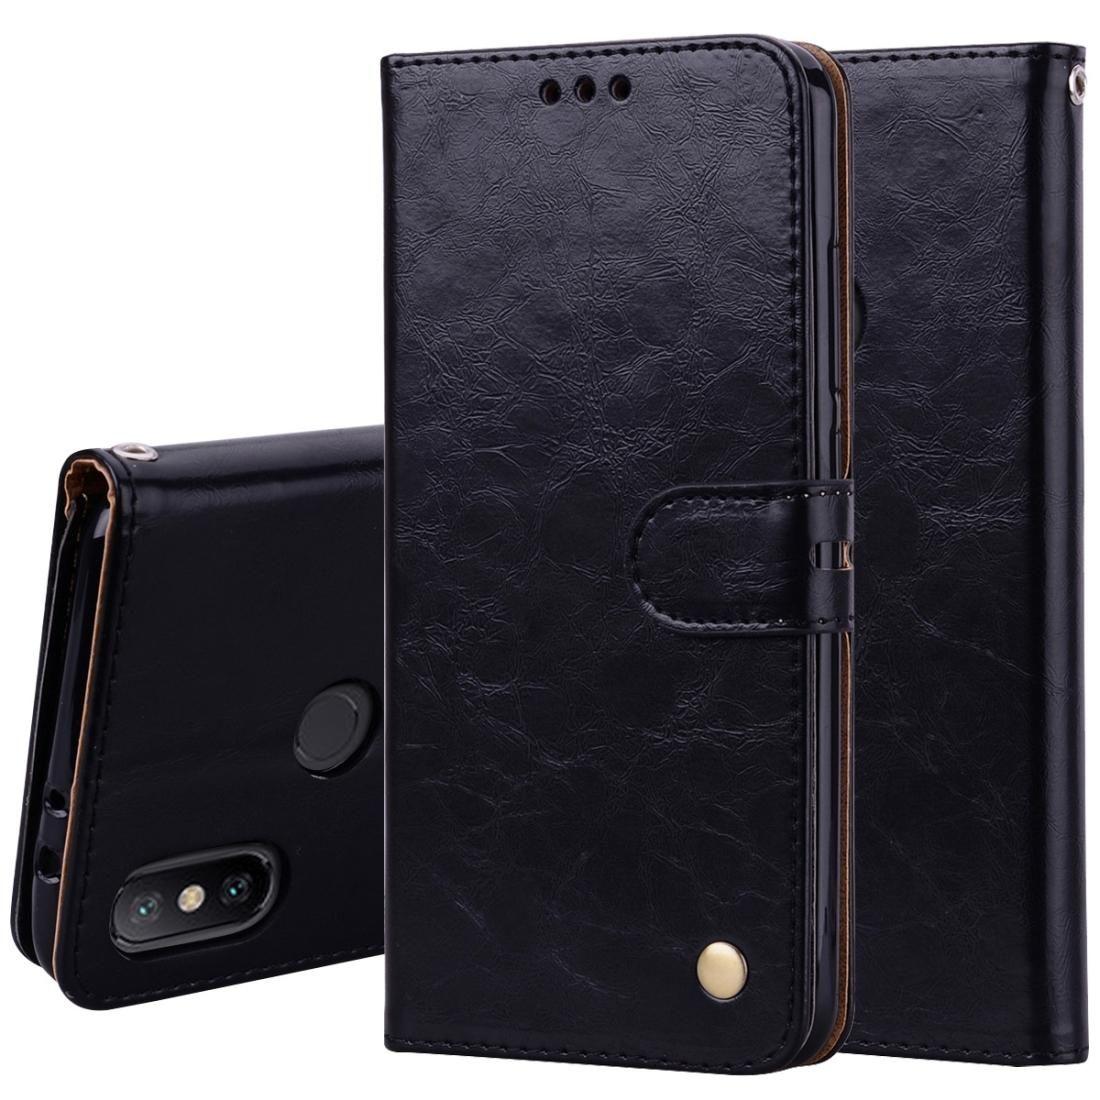 Estilo de negócios Oil Wax Texture Horizontal Leather Case Virar para Xiaomi Mi 6X / A2, com Titular Slots Carteira